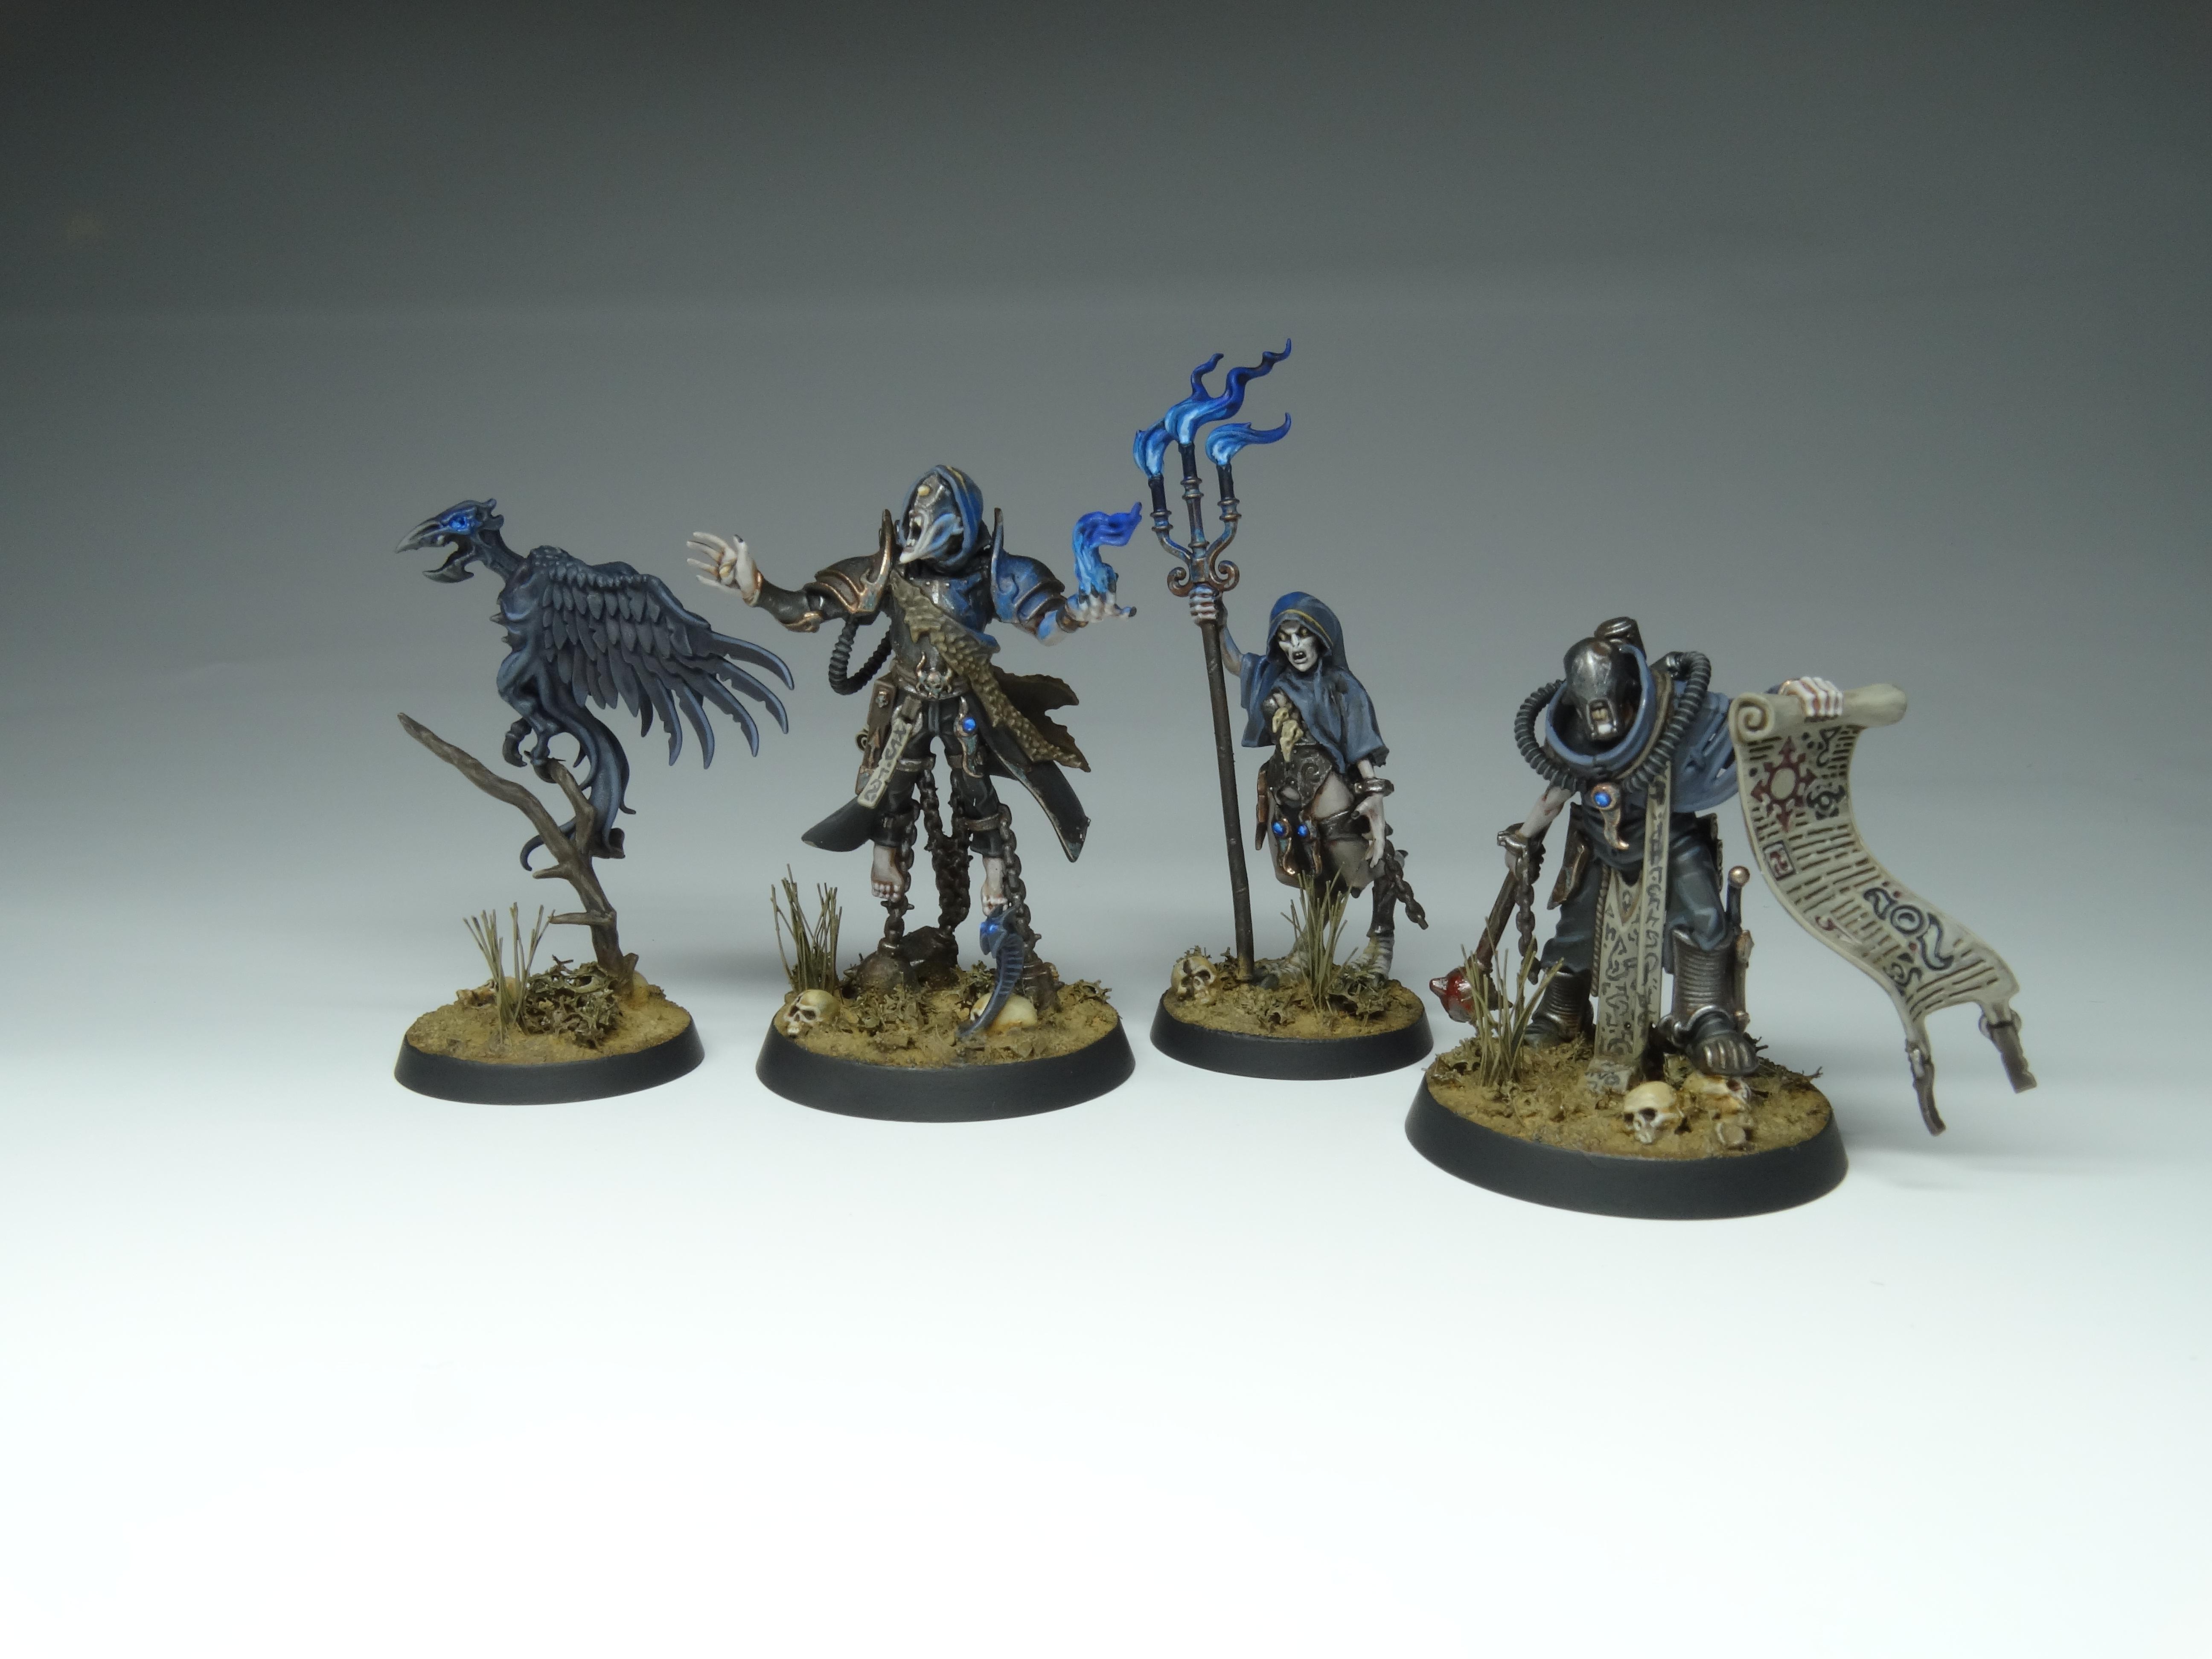 Chaos, Conversion, Cultists, Inq28, Inquisimunda, Kitbash, Necromunda, Object Source Lighting, Rogue Psyker, Tzeentch, Warhammer 40,000